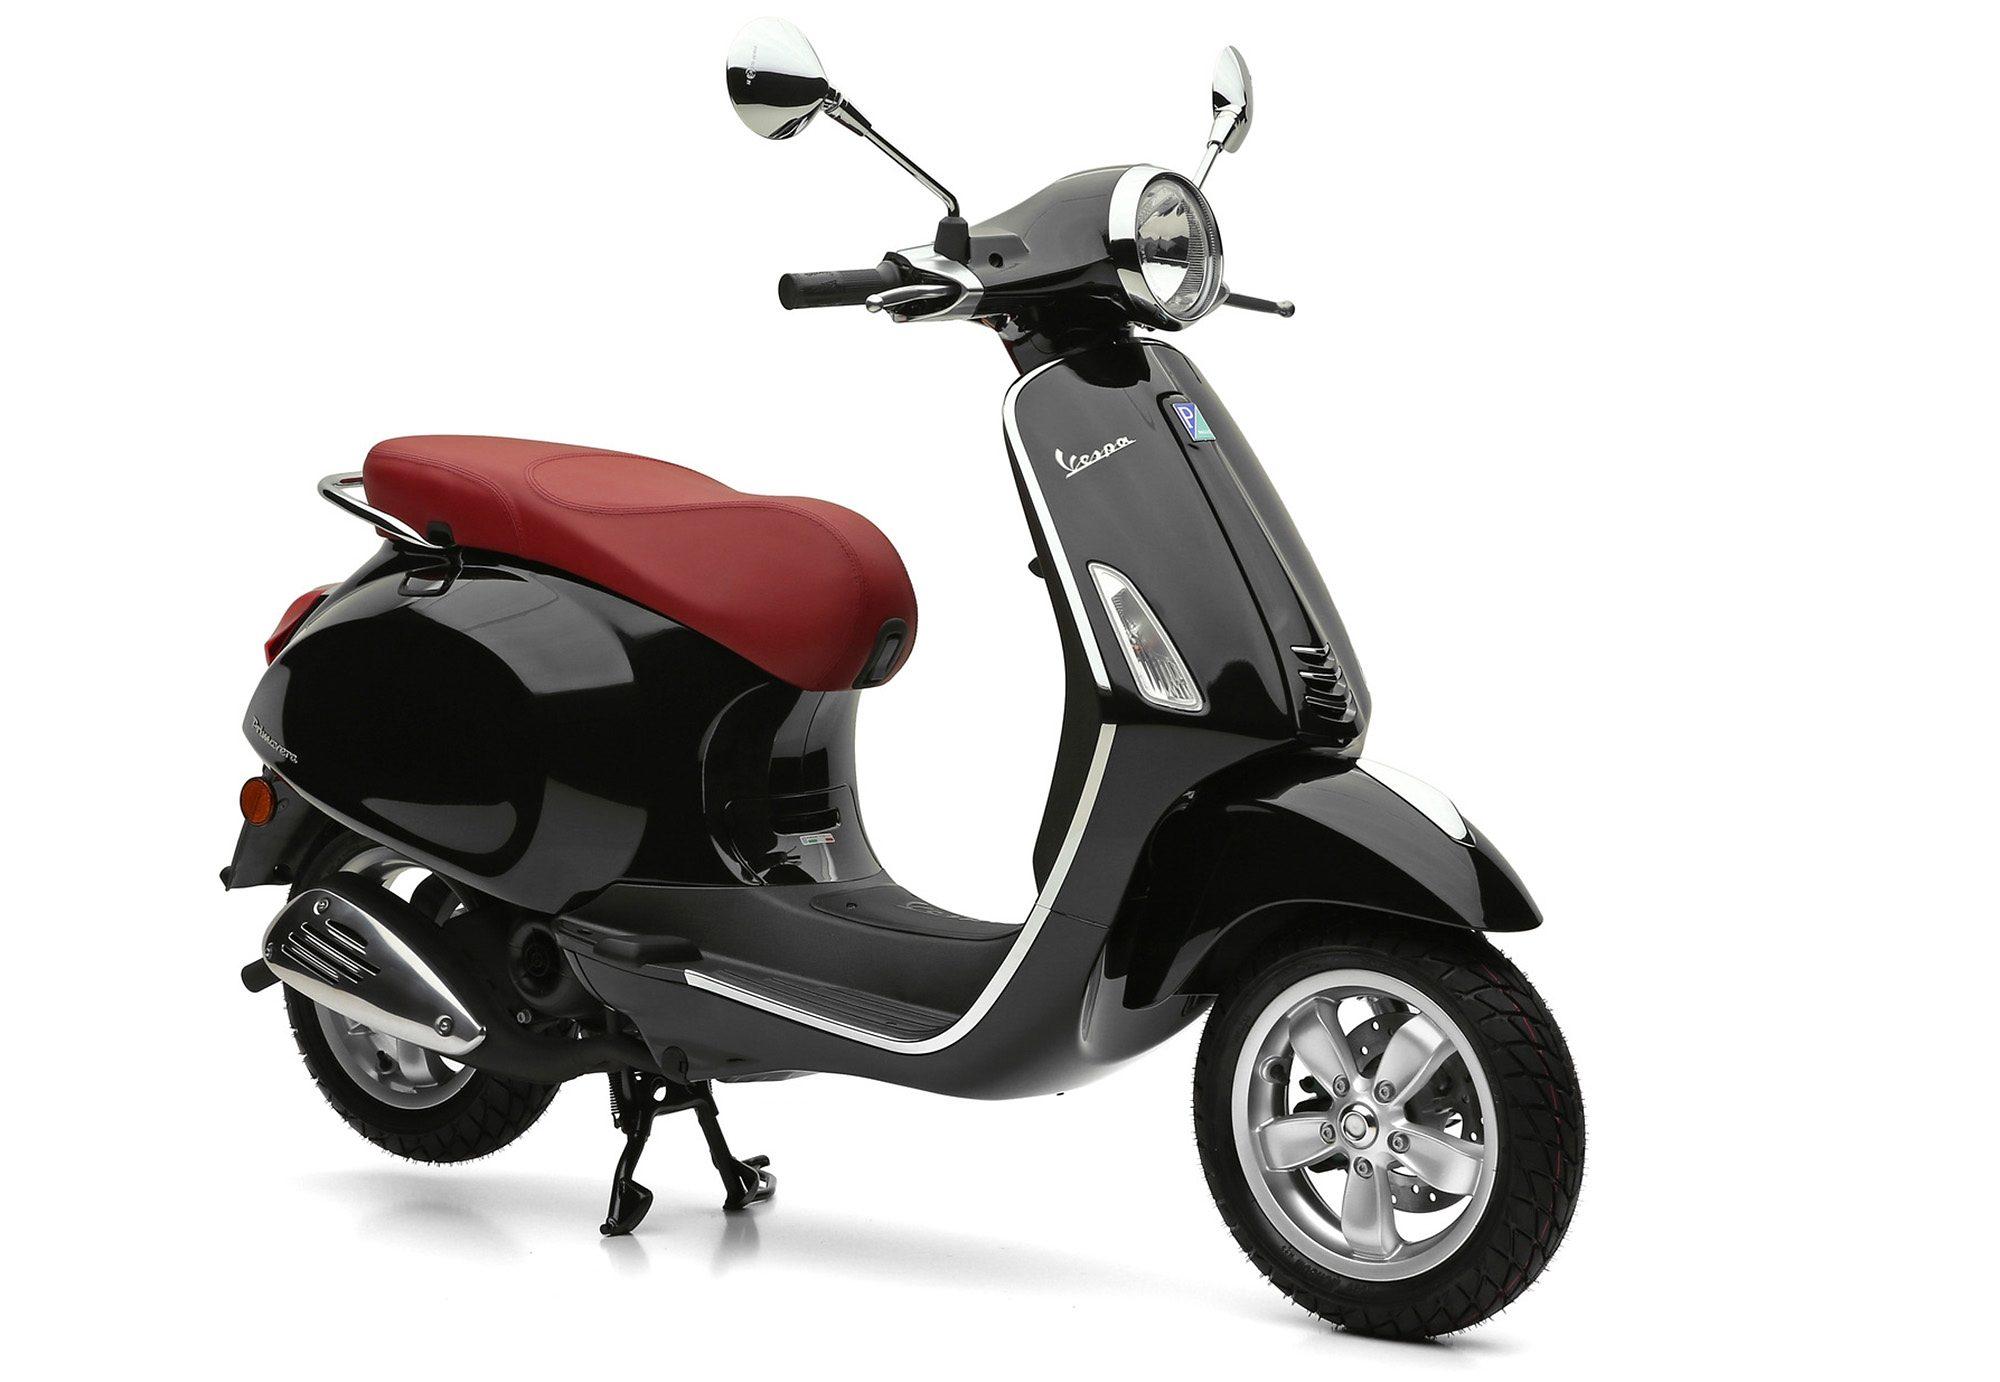 Motorroller, 49 ccm, 4,35 PS, 45 km/h, schwarz, »Primavera«, Vespa